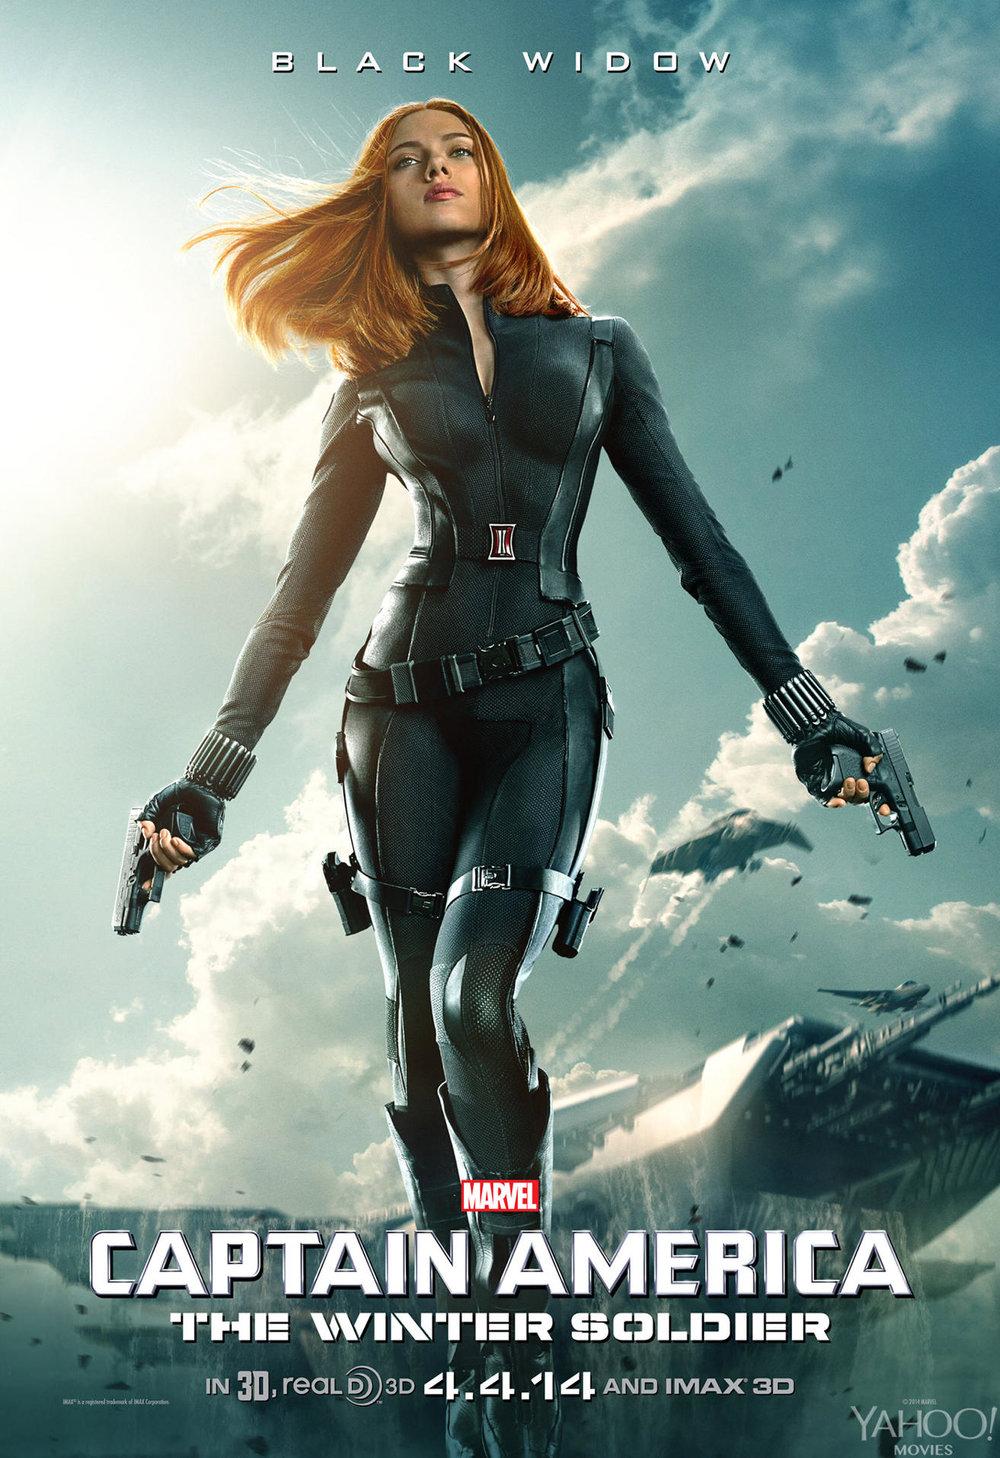 Sexto_poster_de_Captain_America_The_Winter_Soldier.jpg